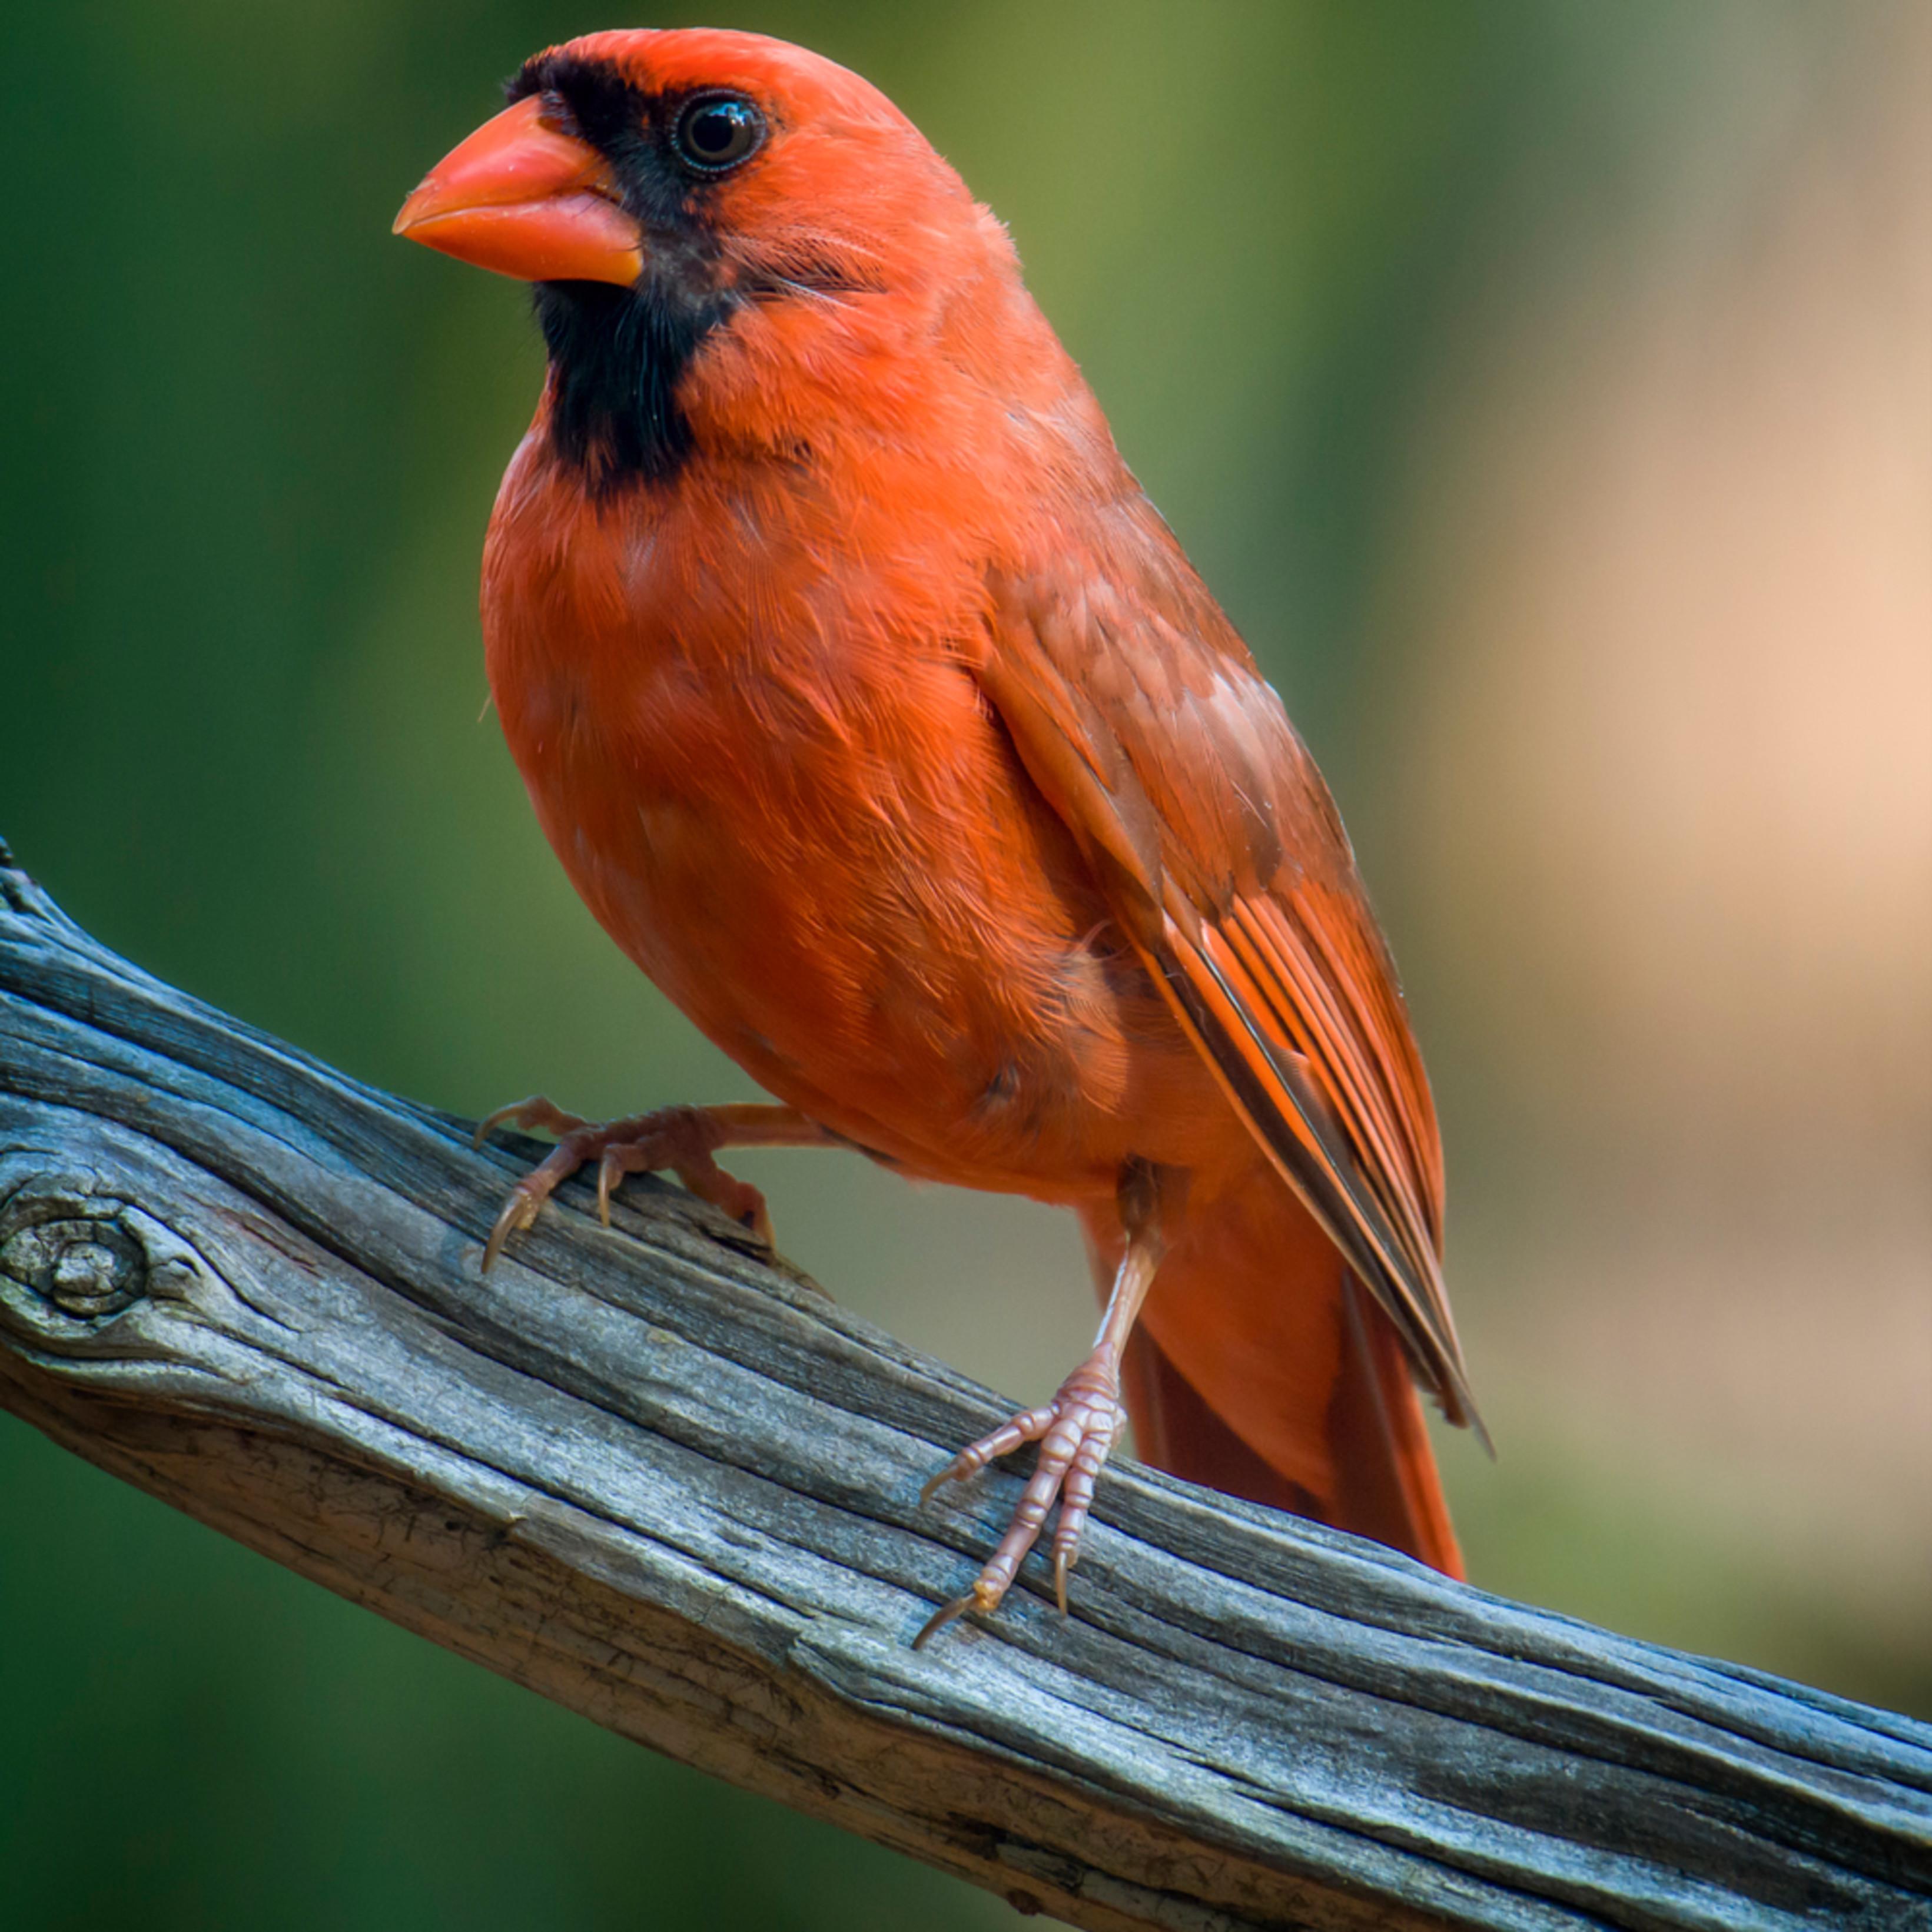 Backyard birds   june 2020 x 20200622 1167 zh4rl9